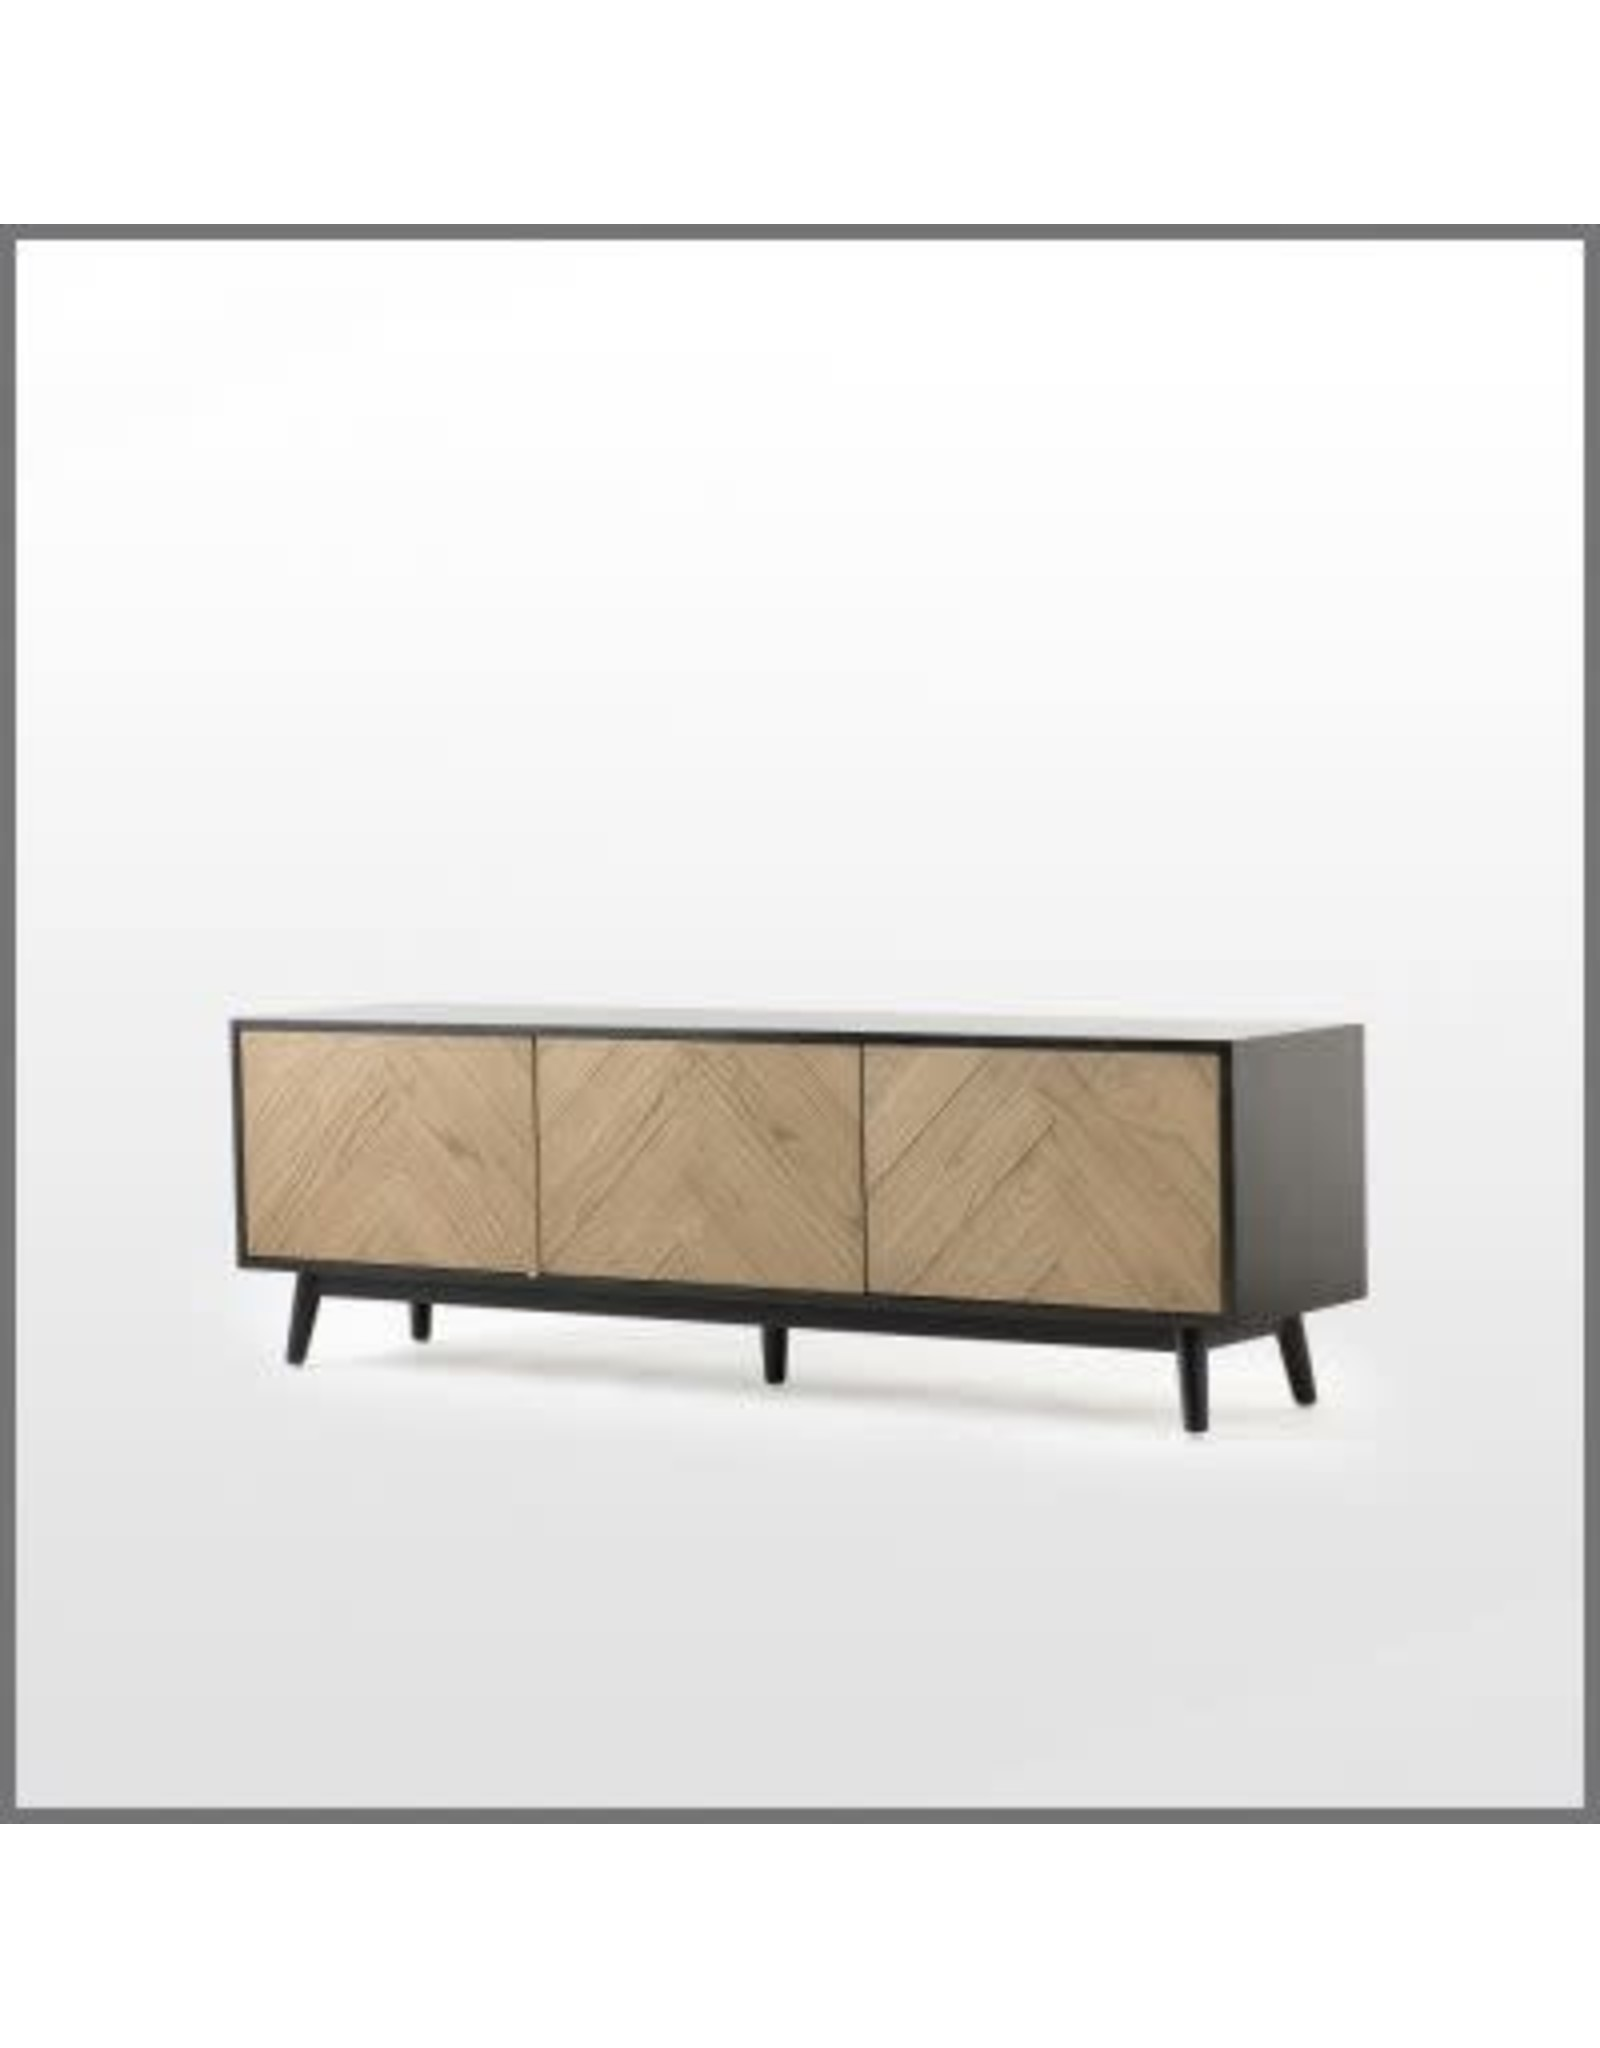 Horgans Emilio Side Board/TV Stand